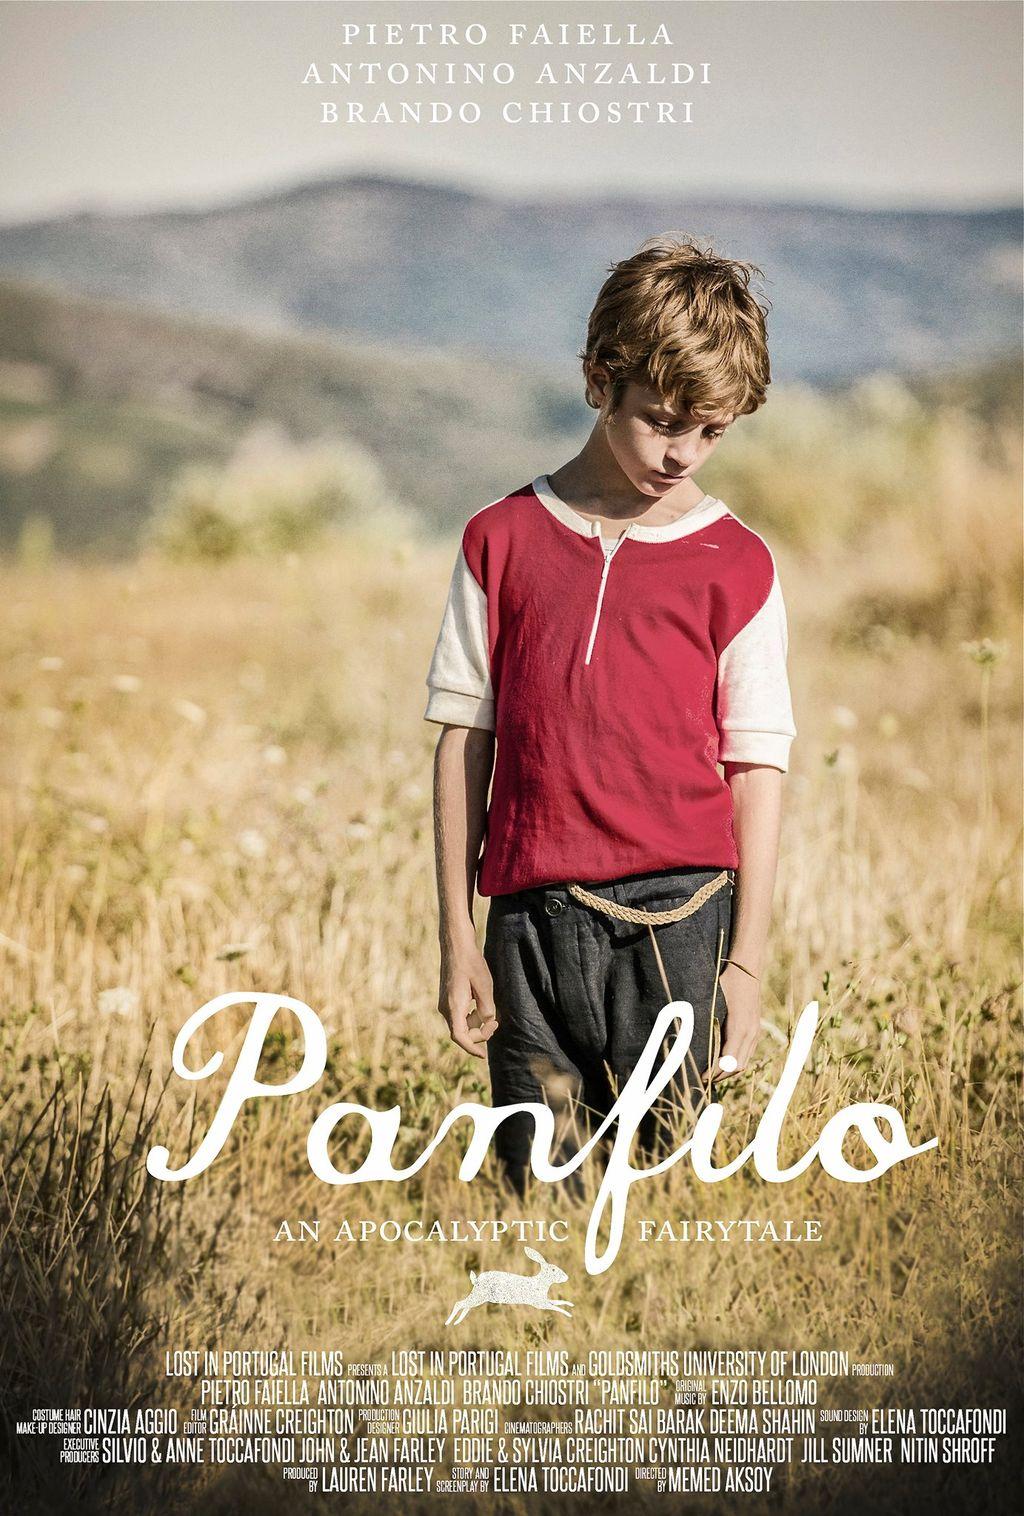 Panfilo: Apokaliptik Bir Masal / Panfilo: An Apocaliptic Fairytale